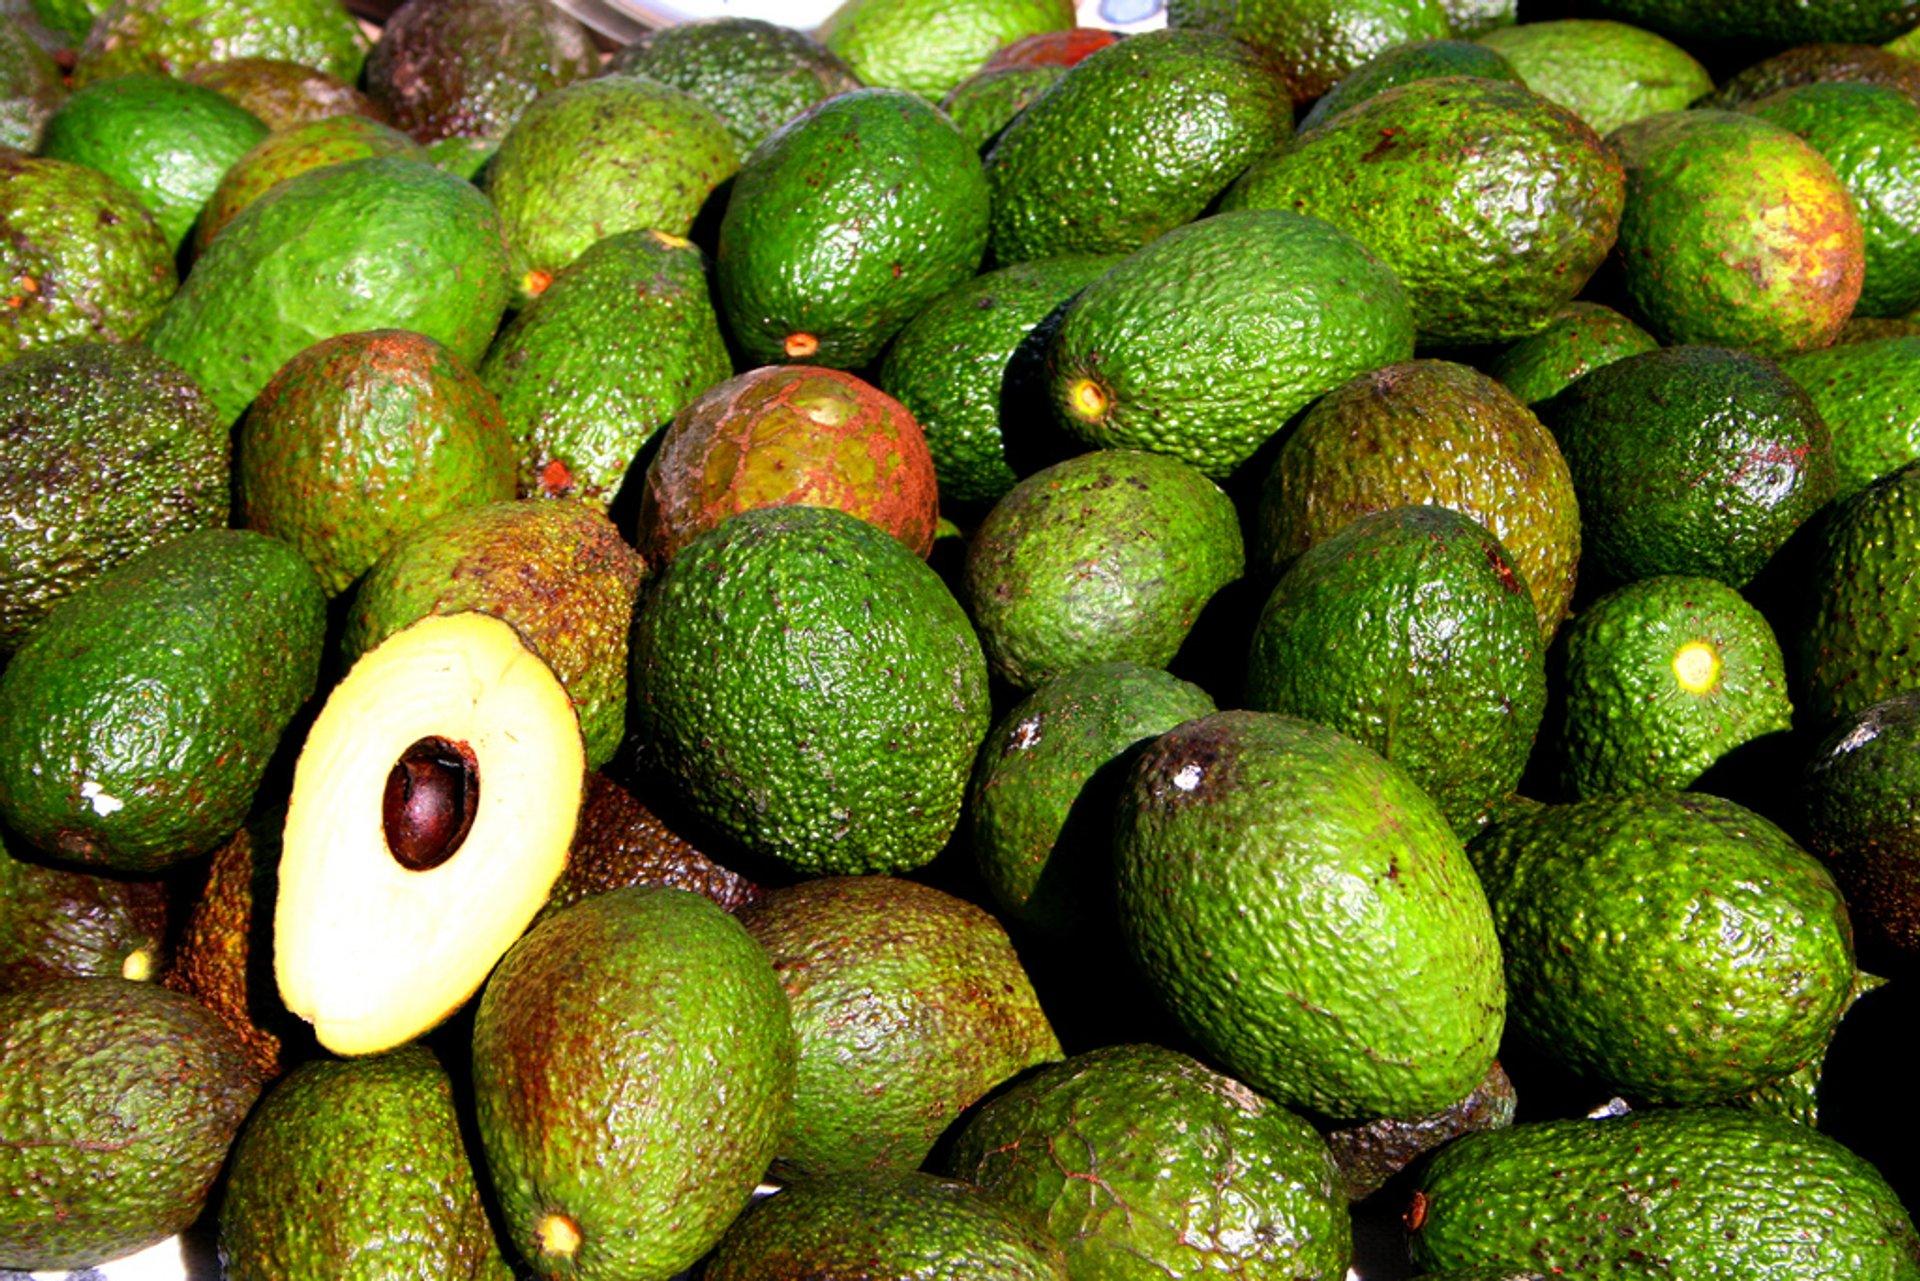 Avocado in Rio de Janeiro 2020 - Best Time